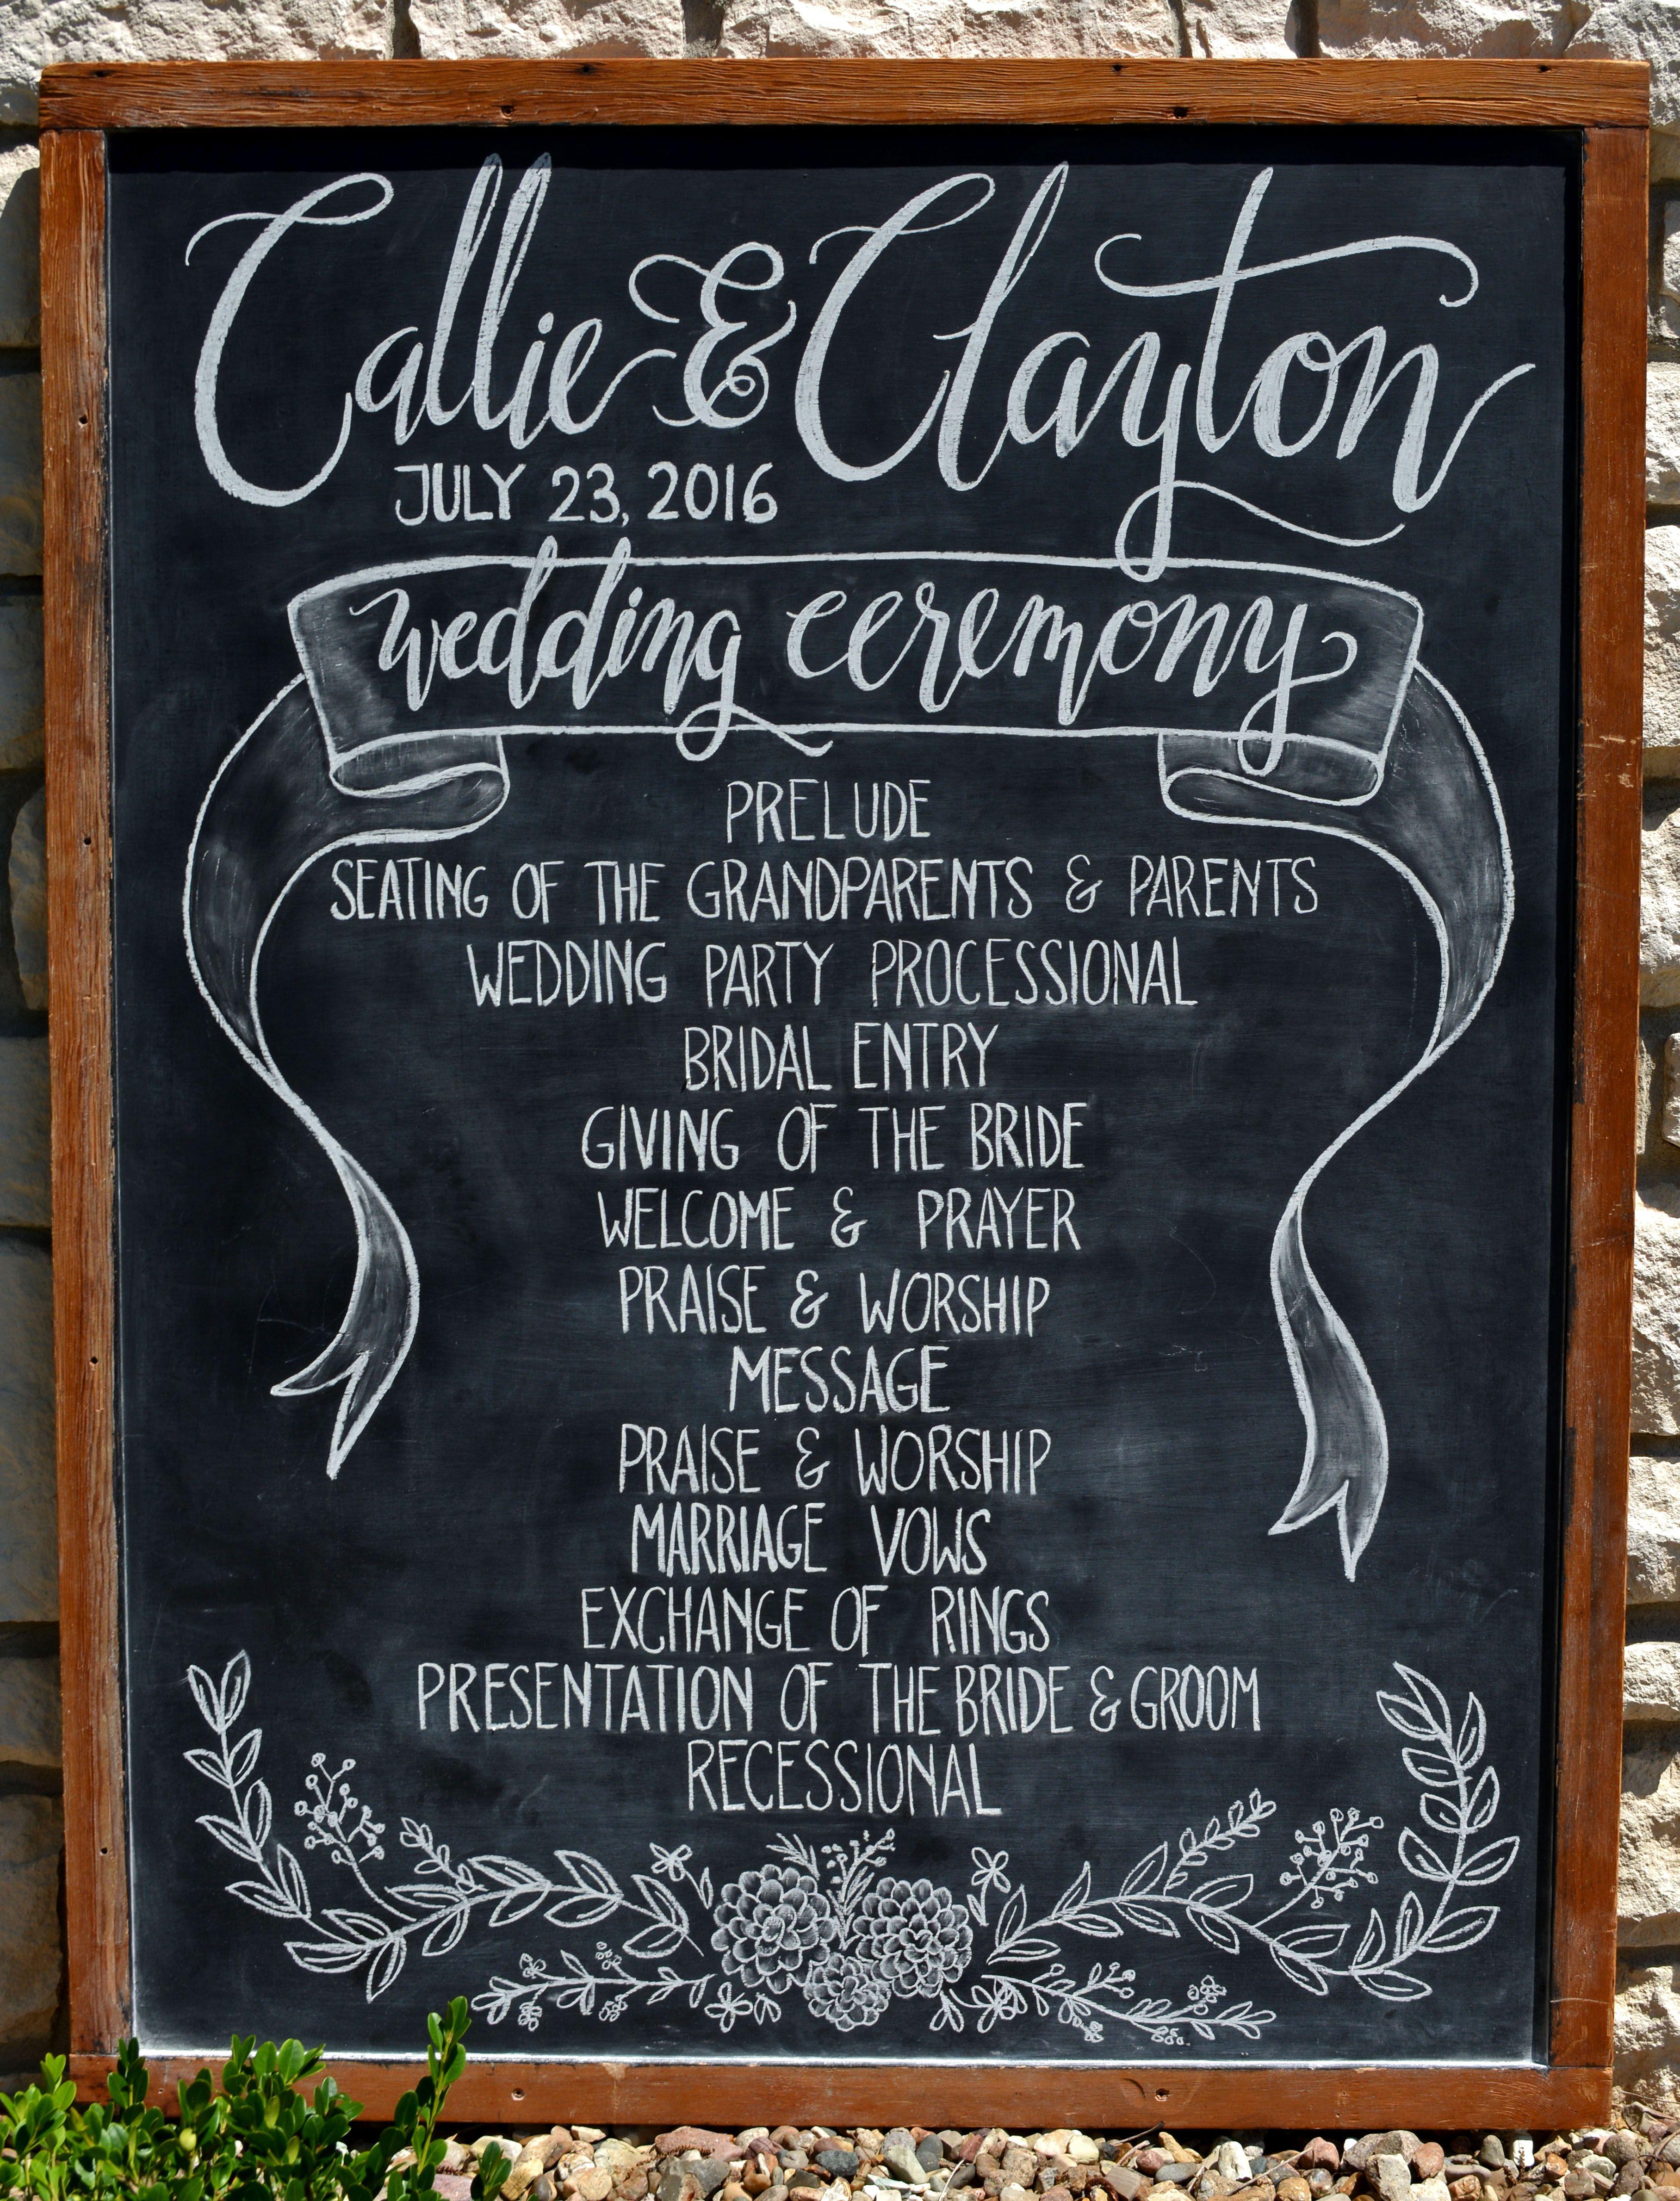 wedding ceremony order of events chalkboard wedding program on a